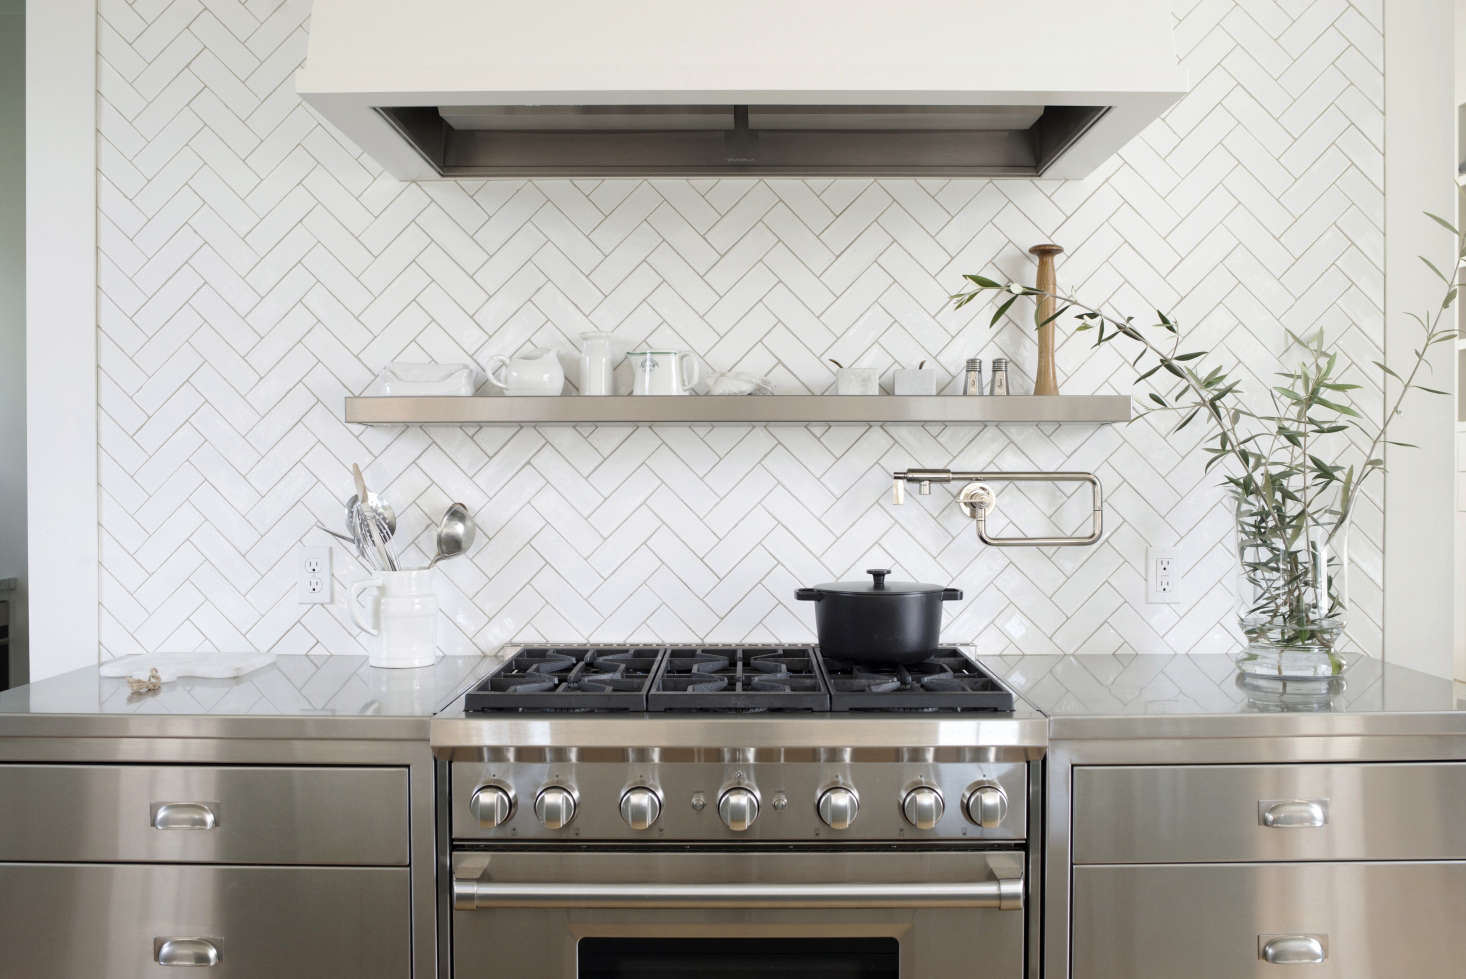 Kitchen Remodel Wisdom: 10 Storage Upgrades You Need to Consider